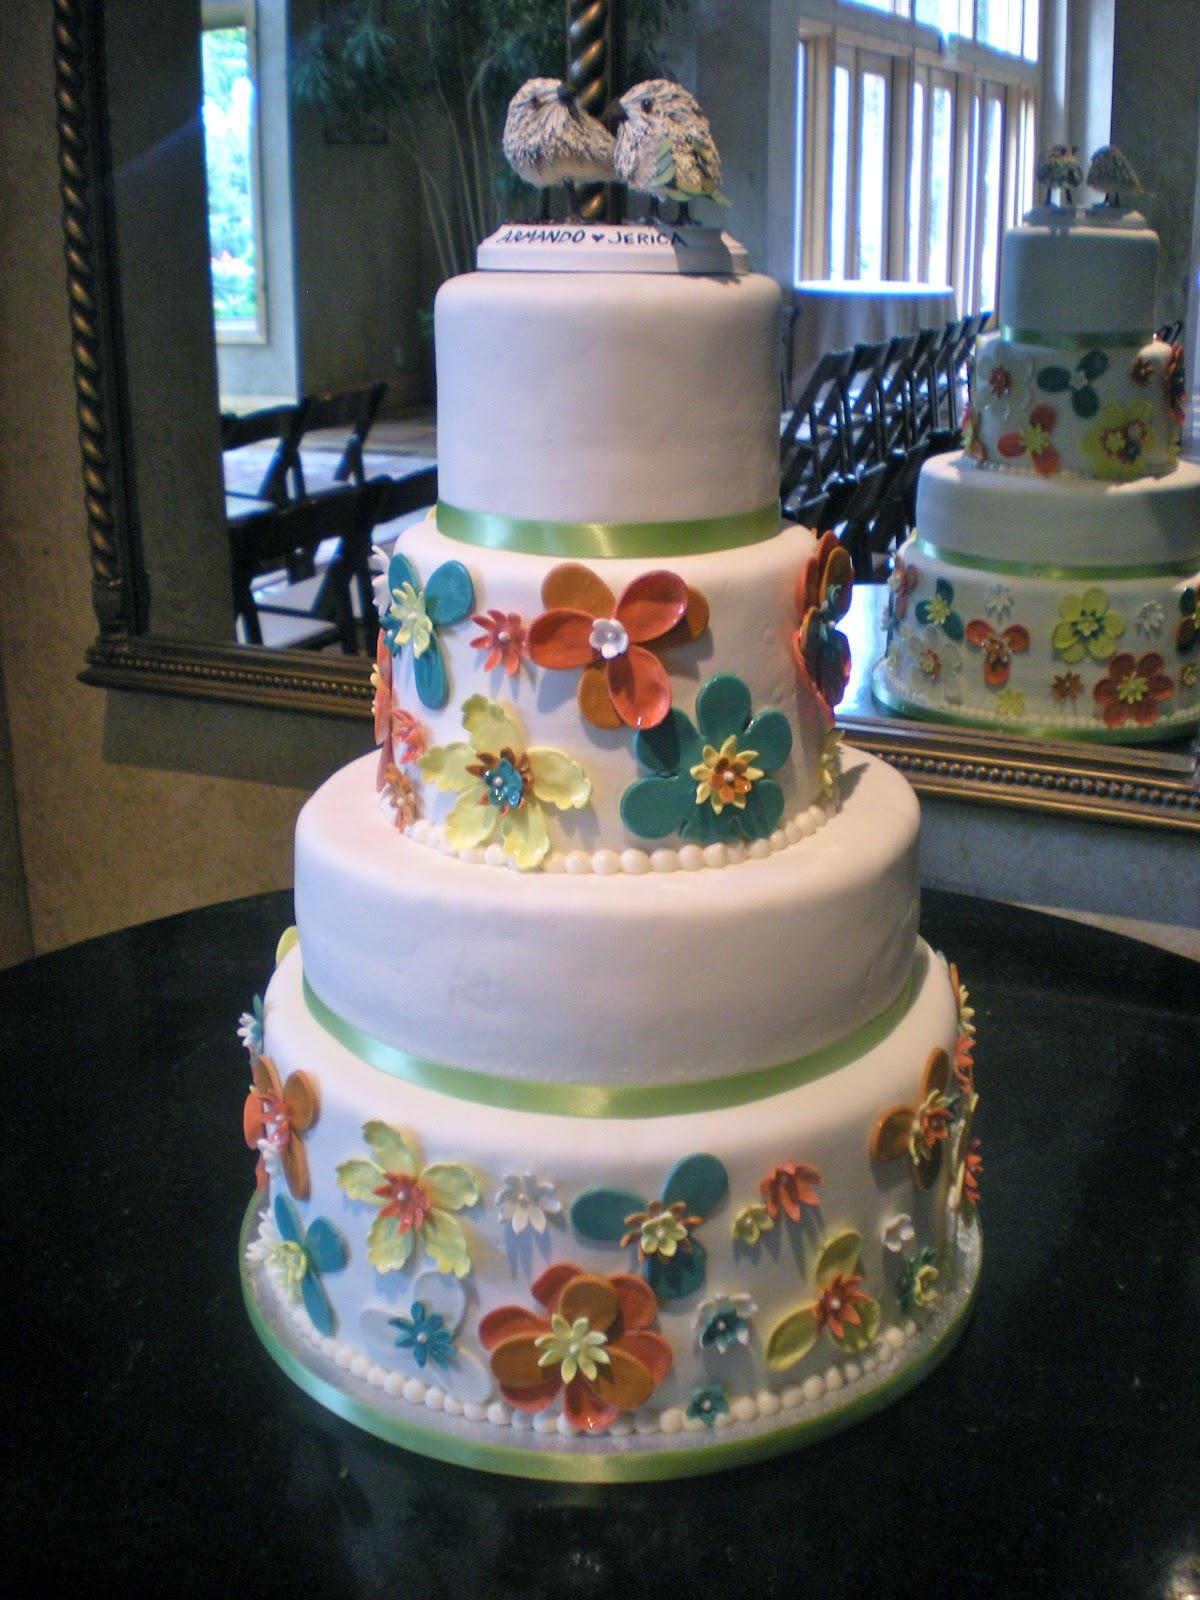 Chandelier Birthday Cake